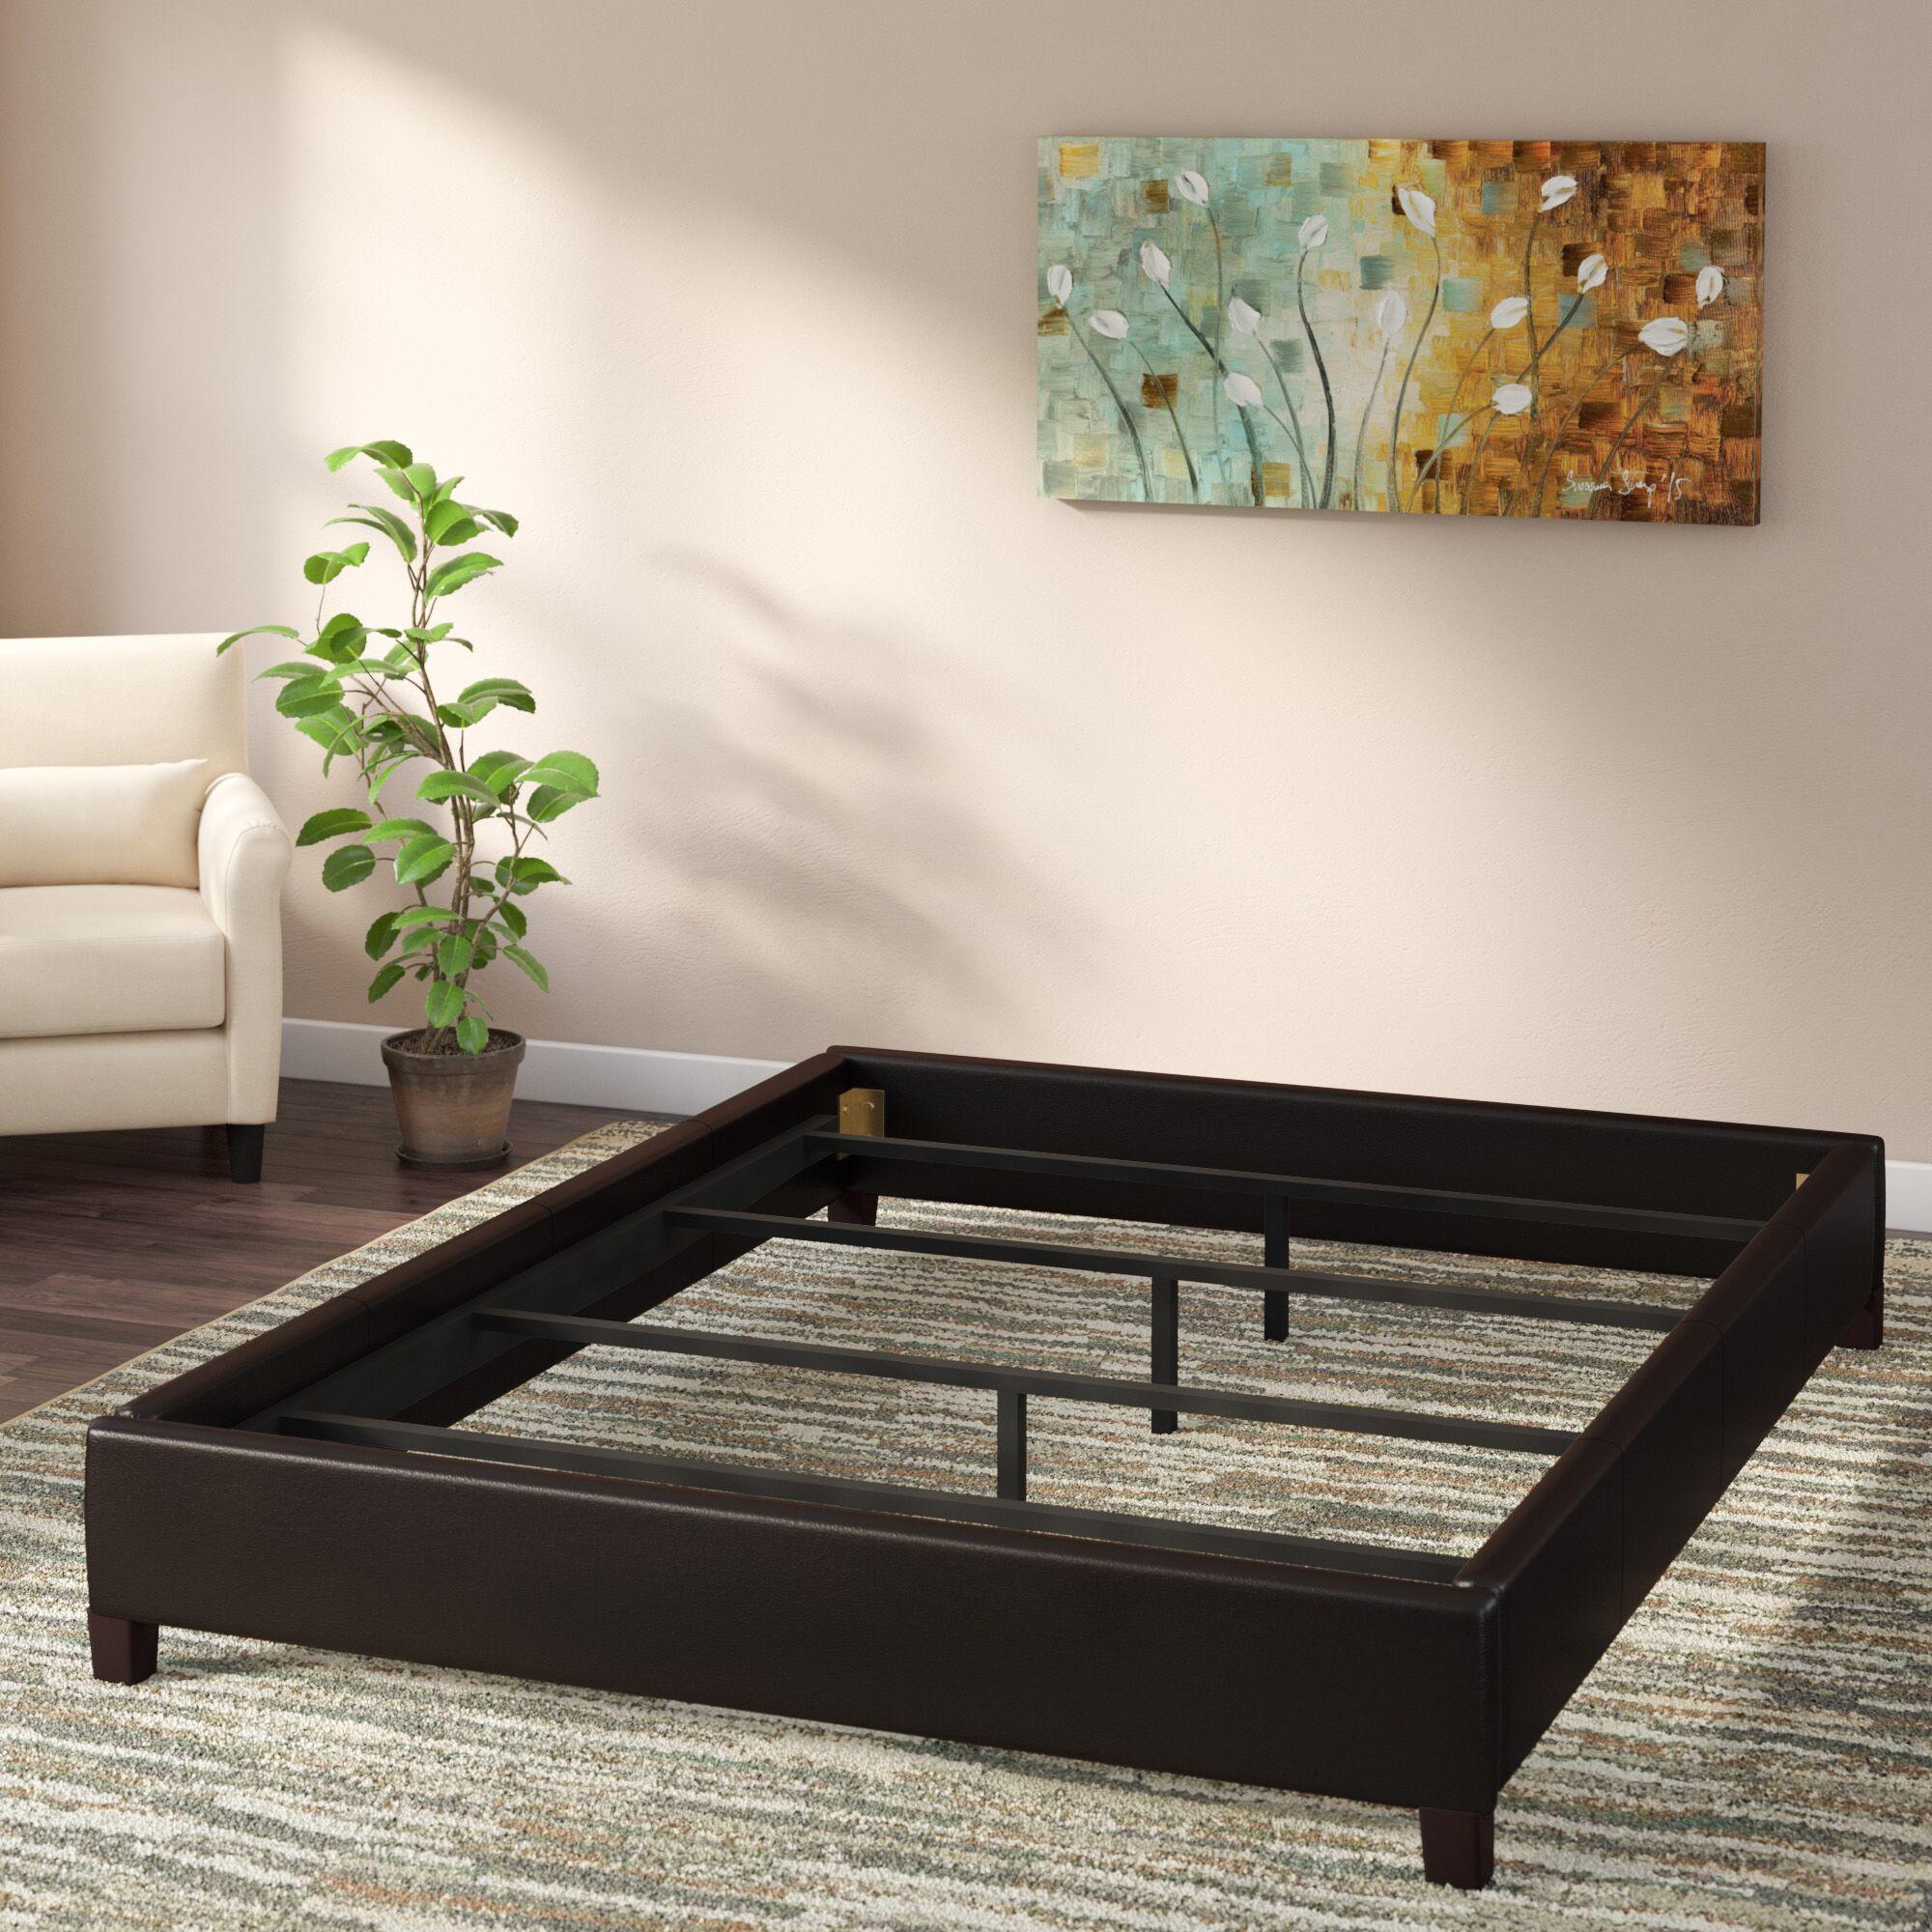 Almondsbury Bed Frame Size: Queen